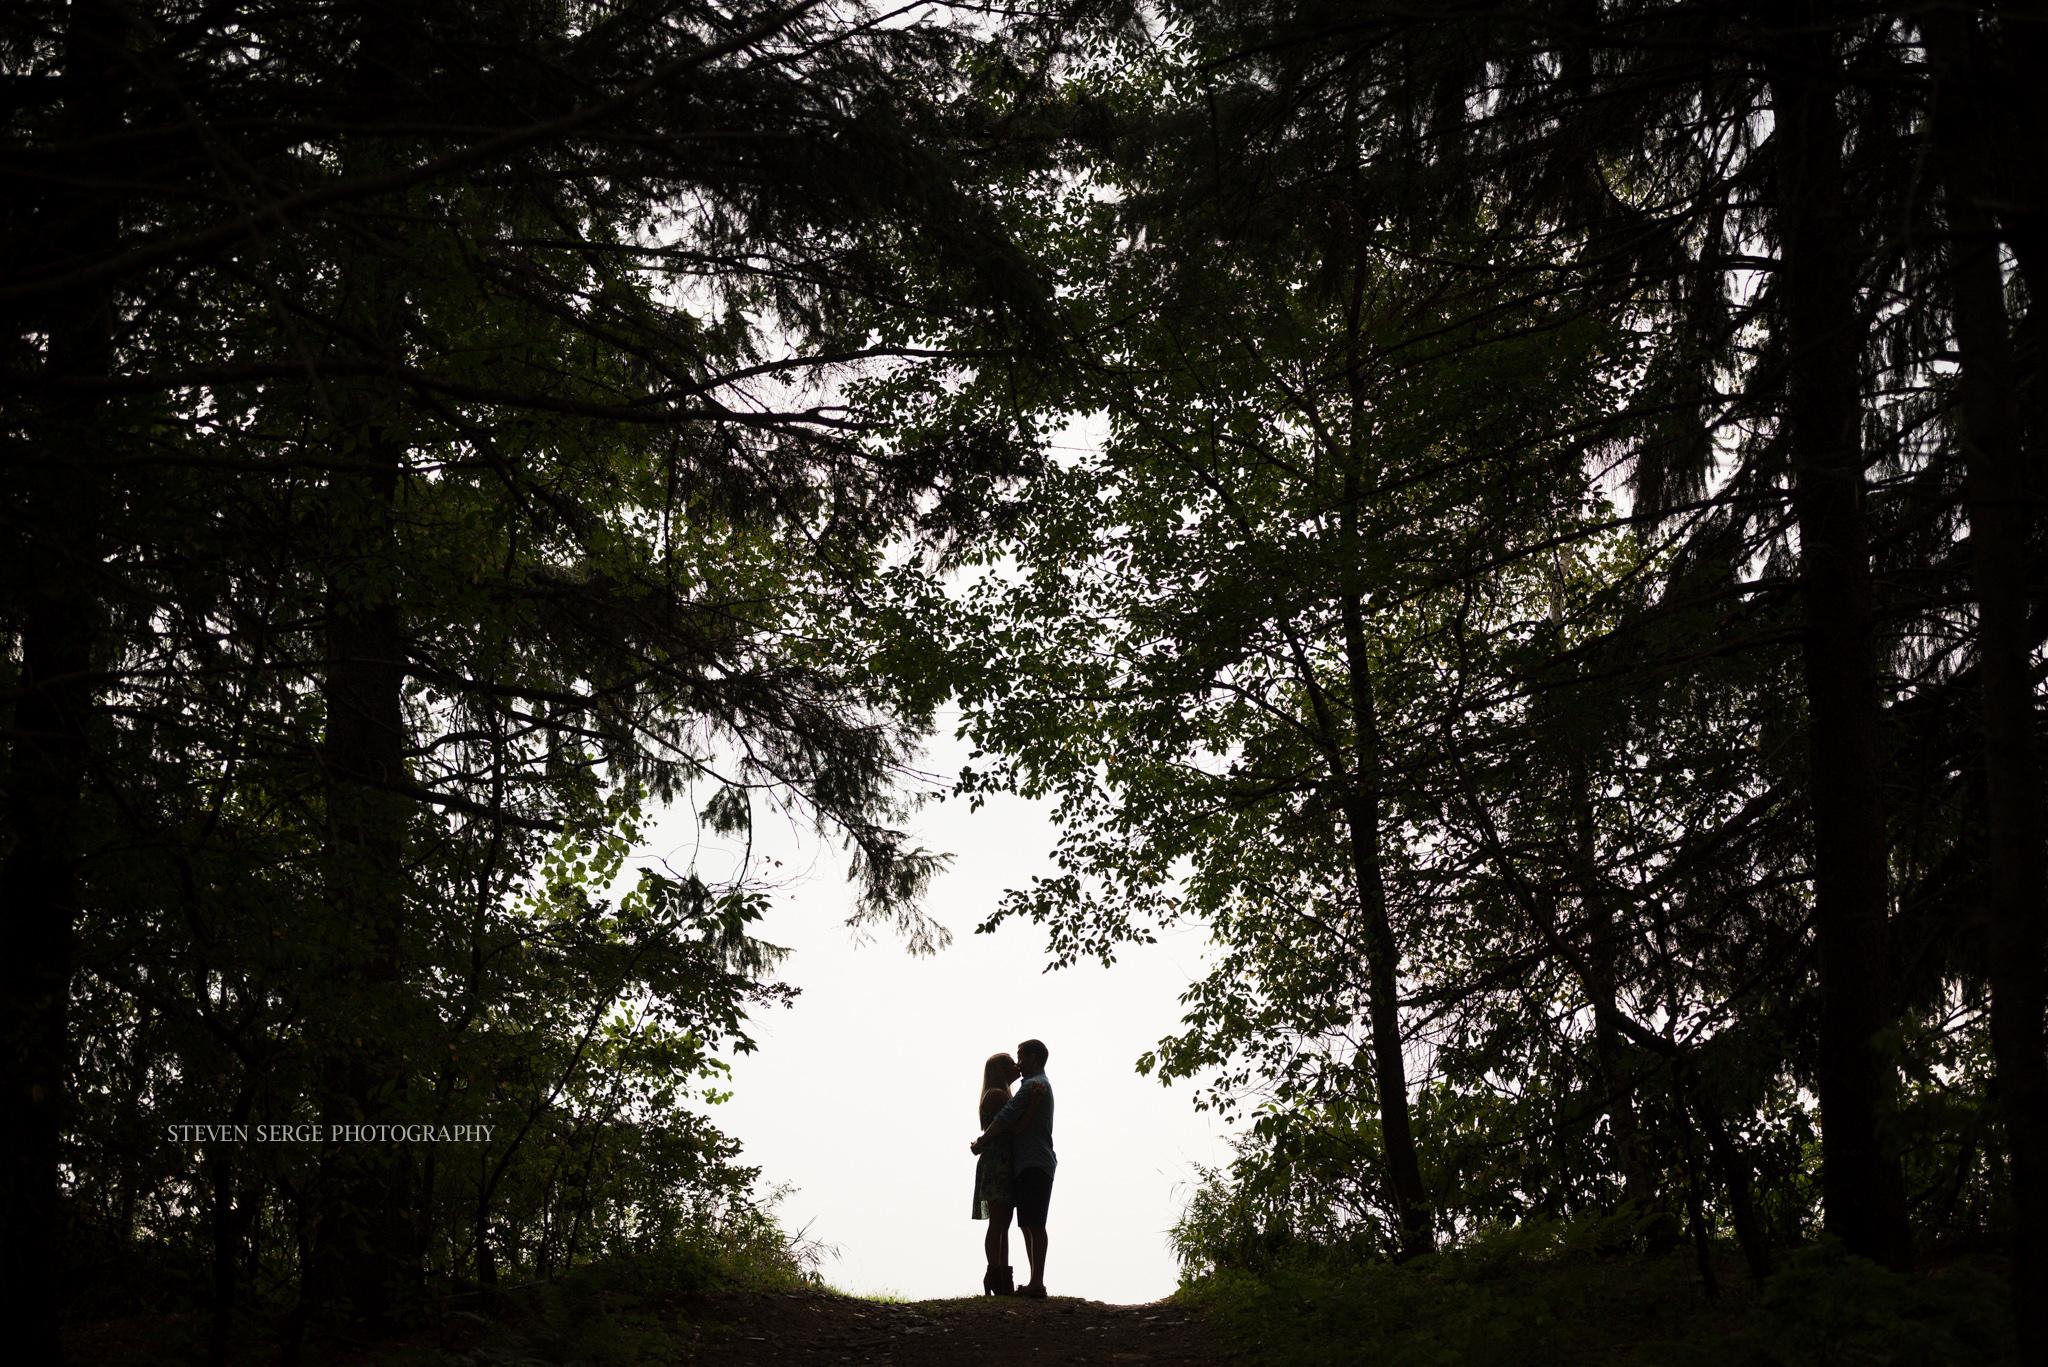 Scranton-Wedding-Photographer-NEPA-Engagement-photography-steven-serge-1.jpg